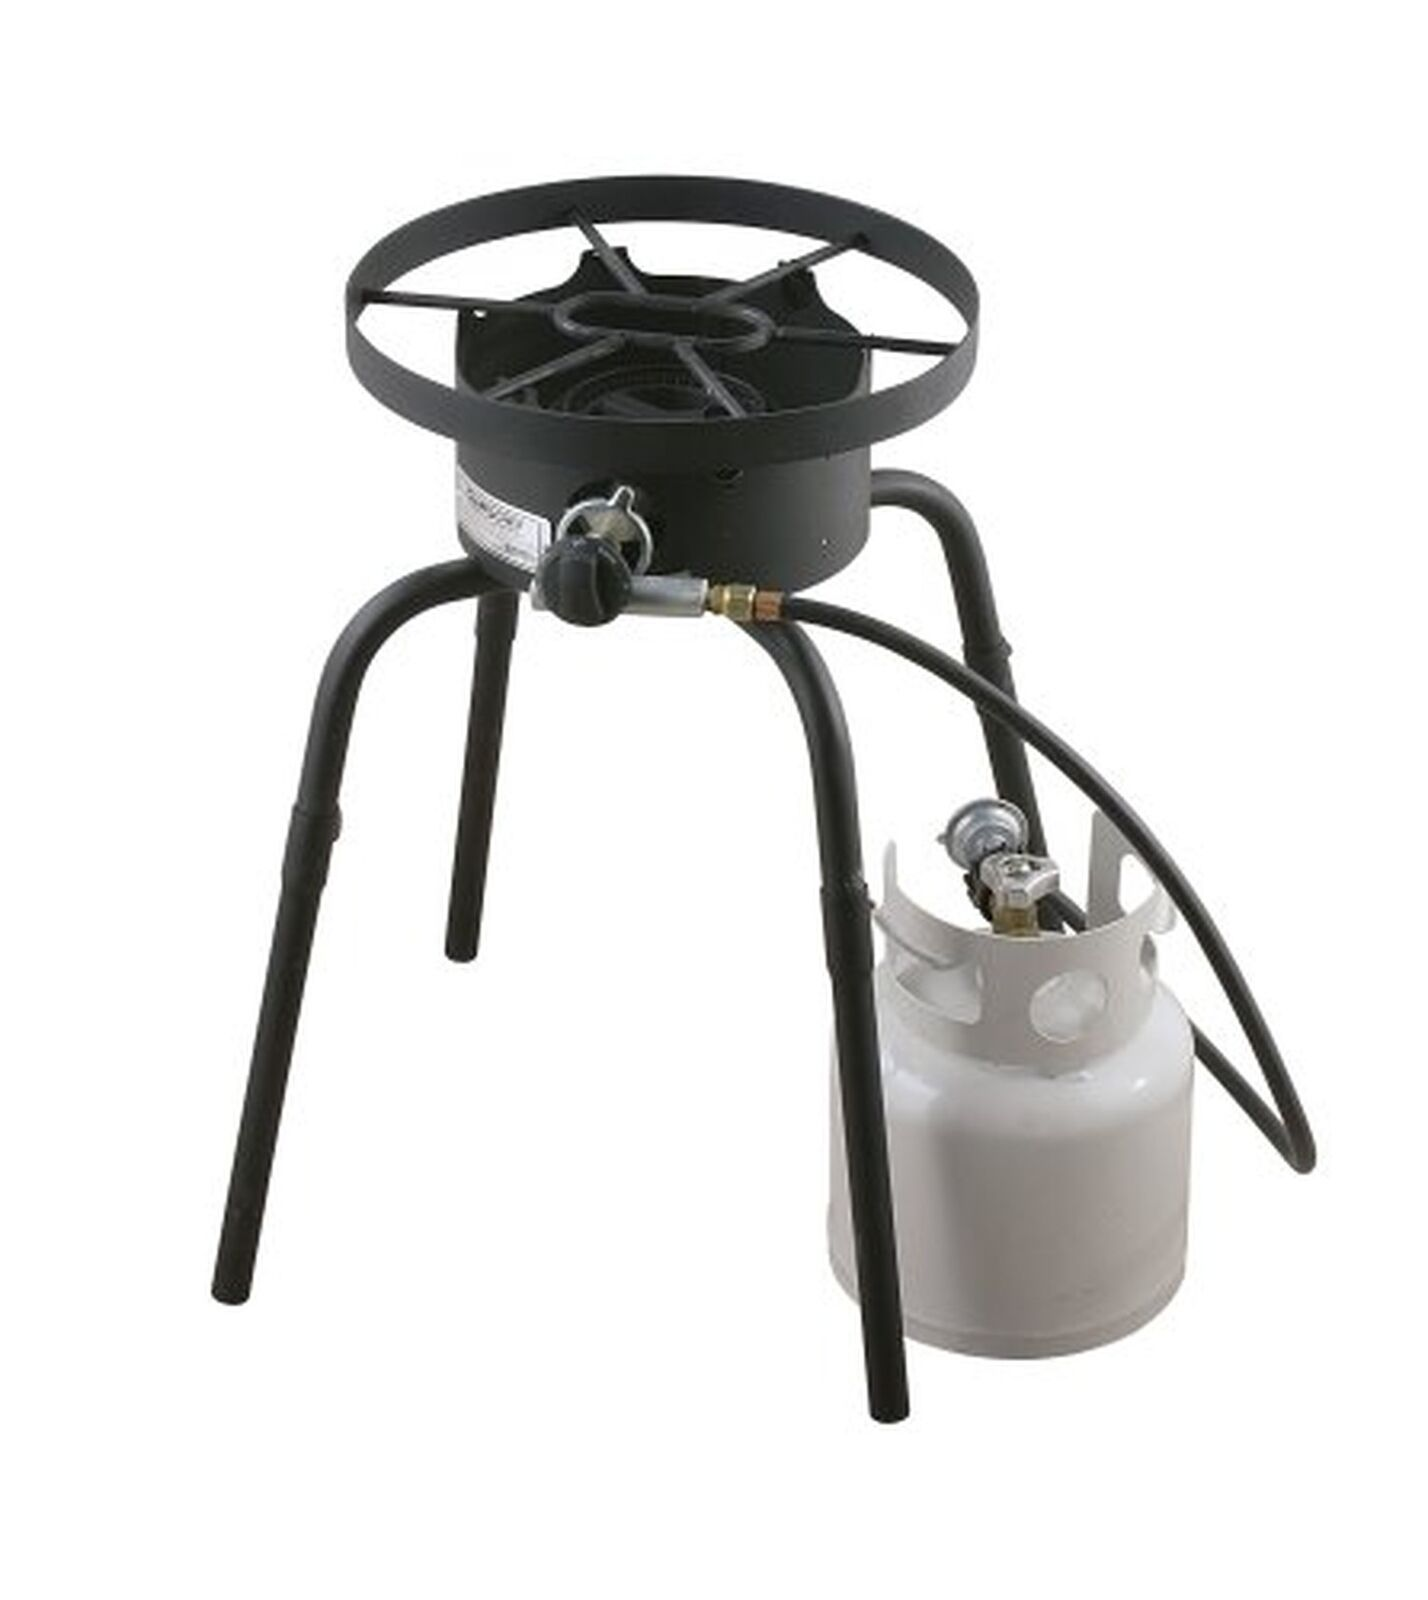 Camp Chef Universal Output  Single Burner Stove One Size  enjoy 50% off